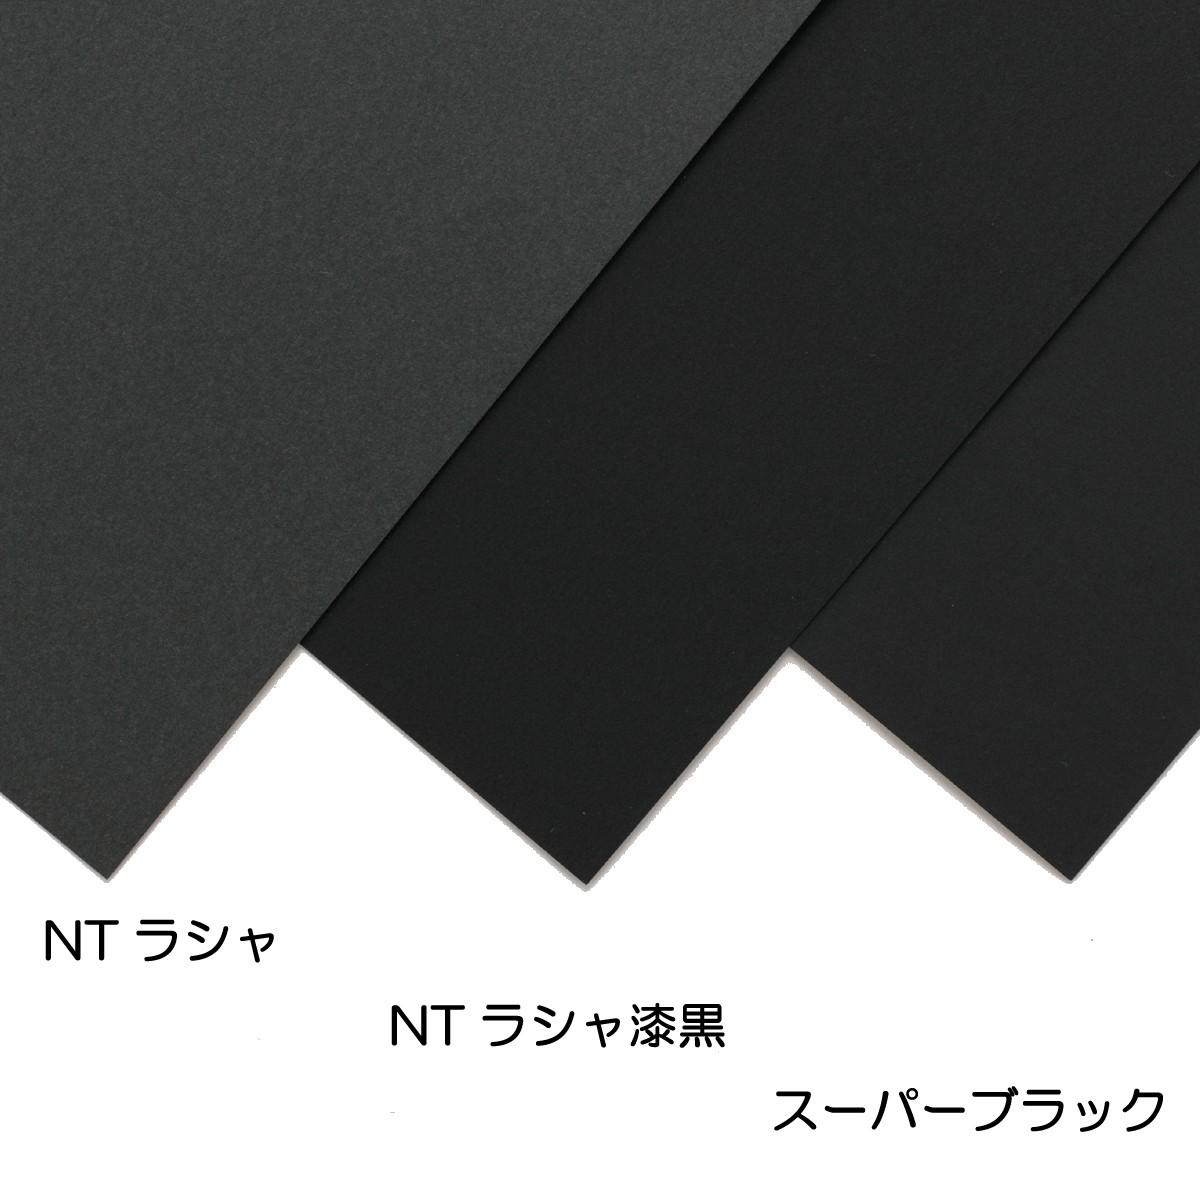 NTラシャ紙 黒 170kg 100枚組 四つ切 【 版画 用紙 紙 絵画 】